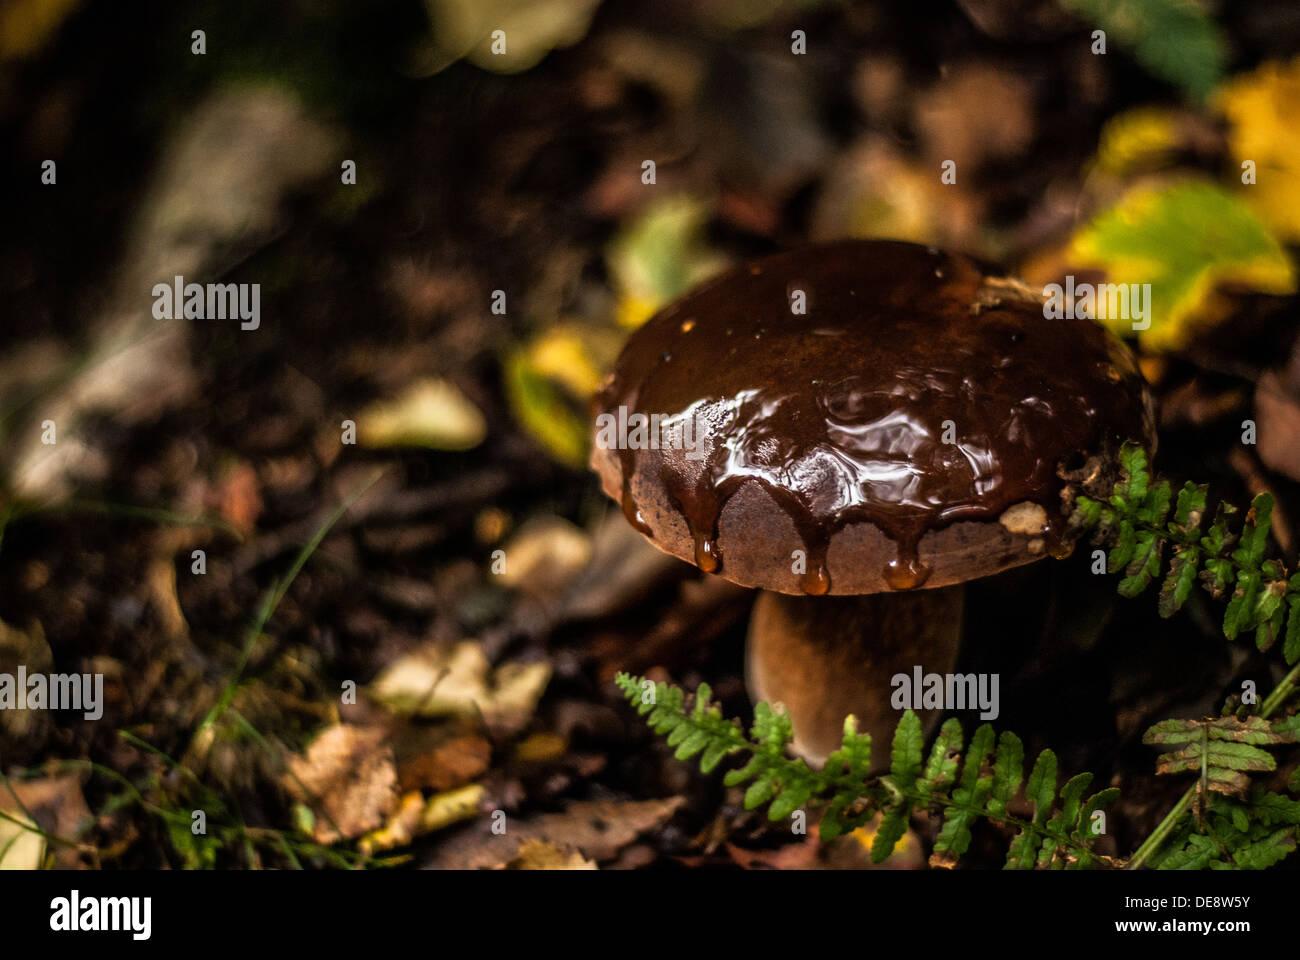 Larch Bolete, Wild Mushrooms, Fungi UK - Stock Image